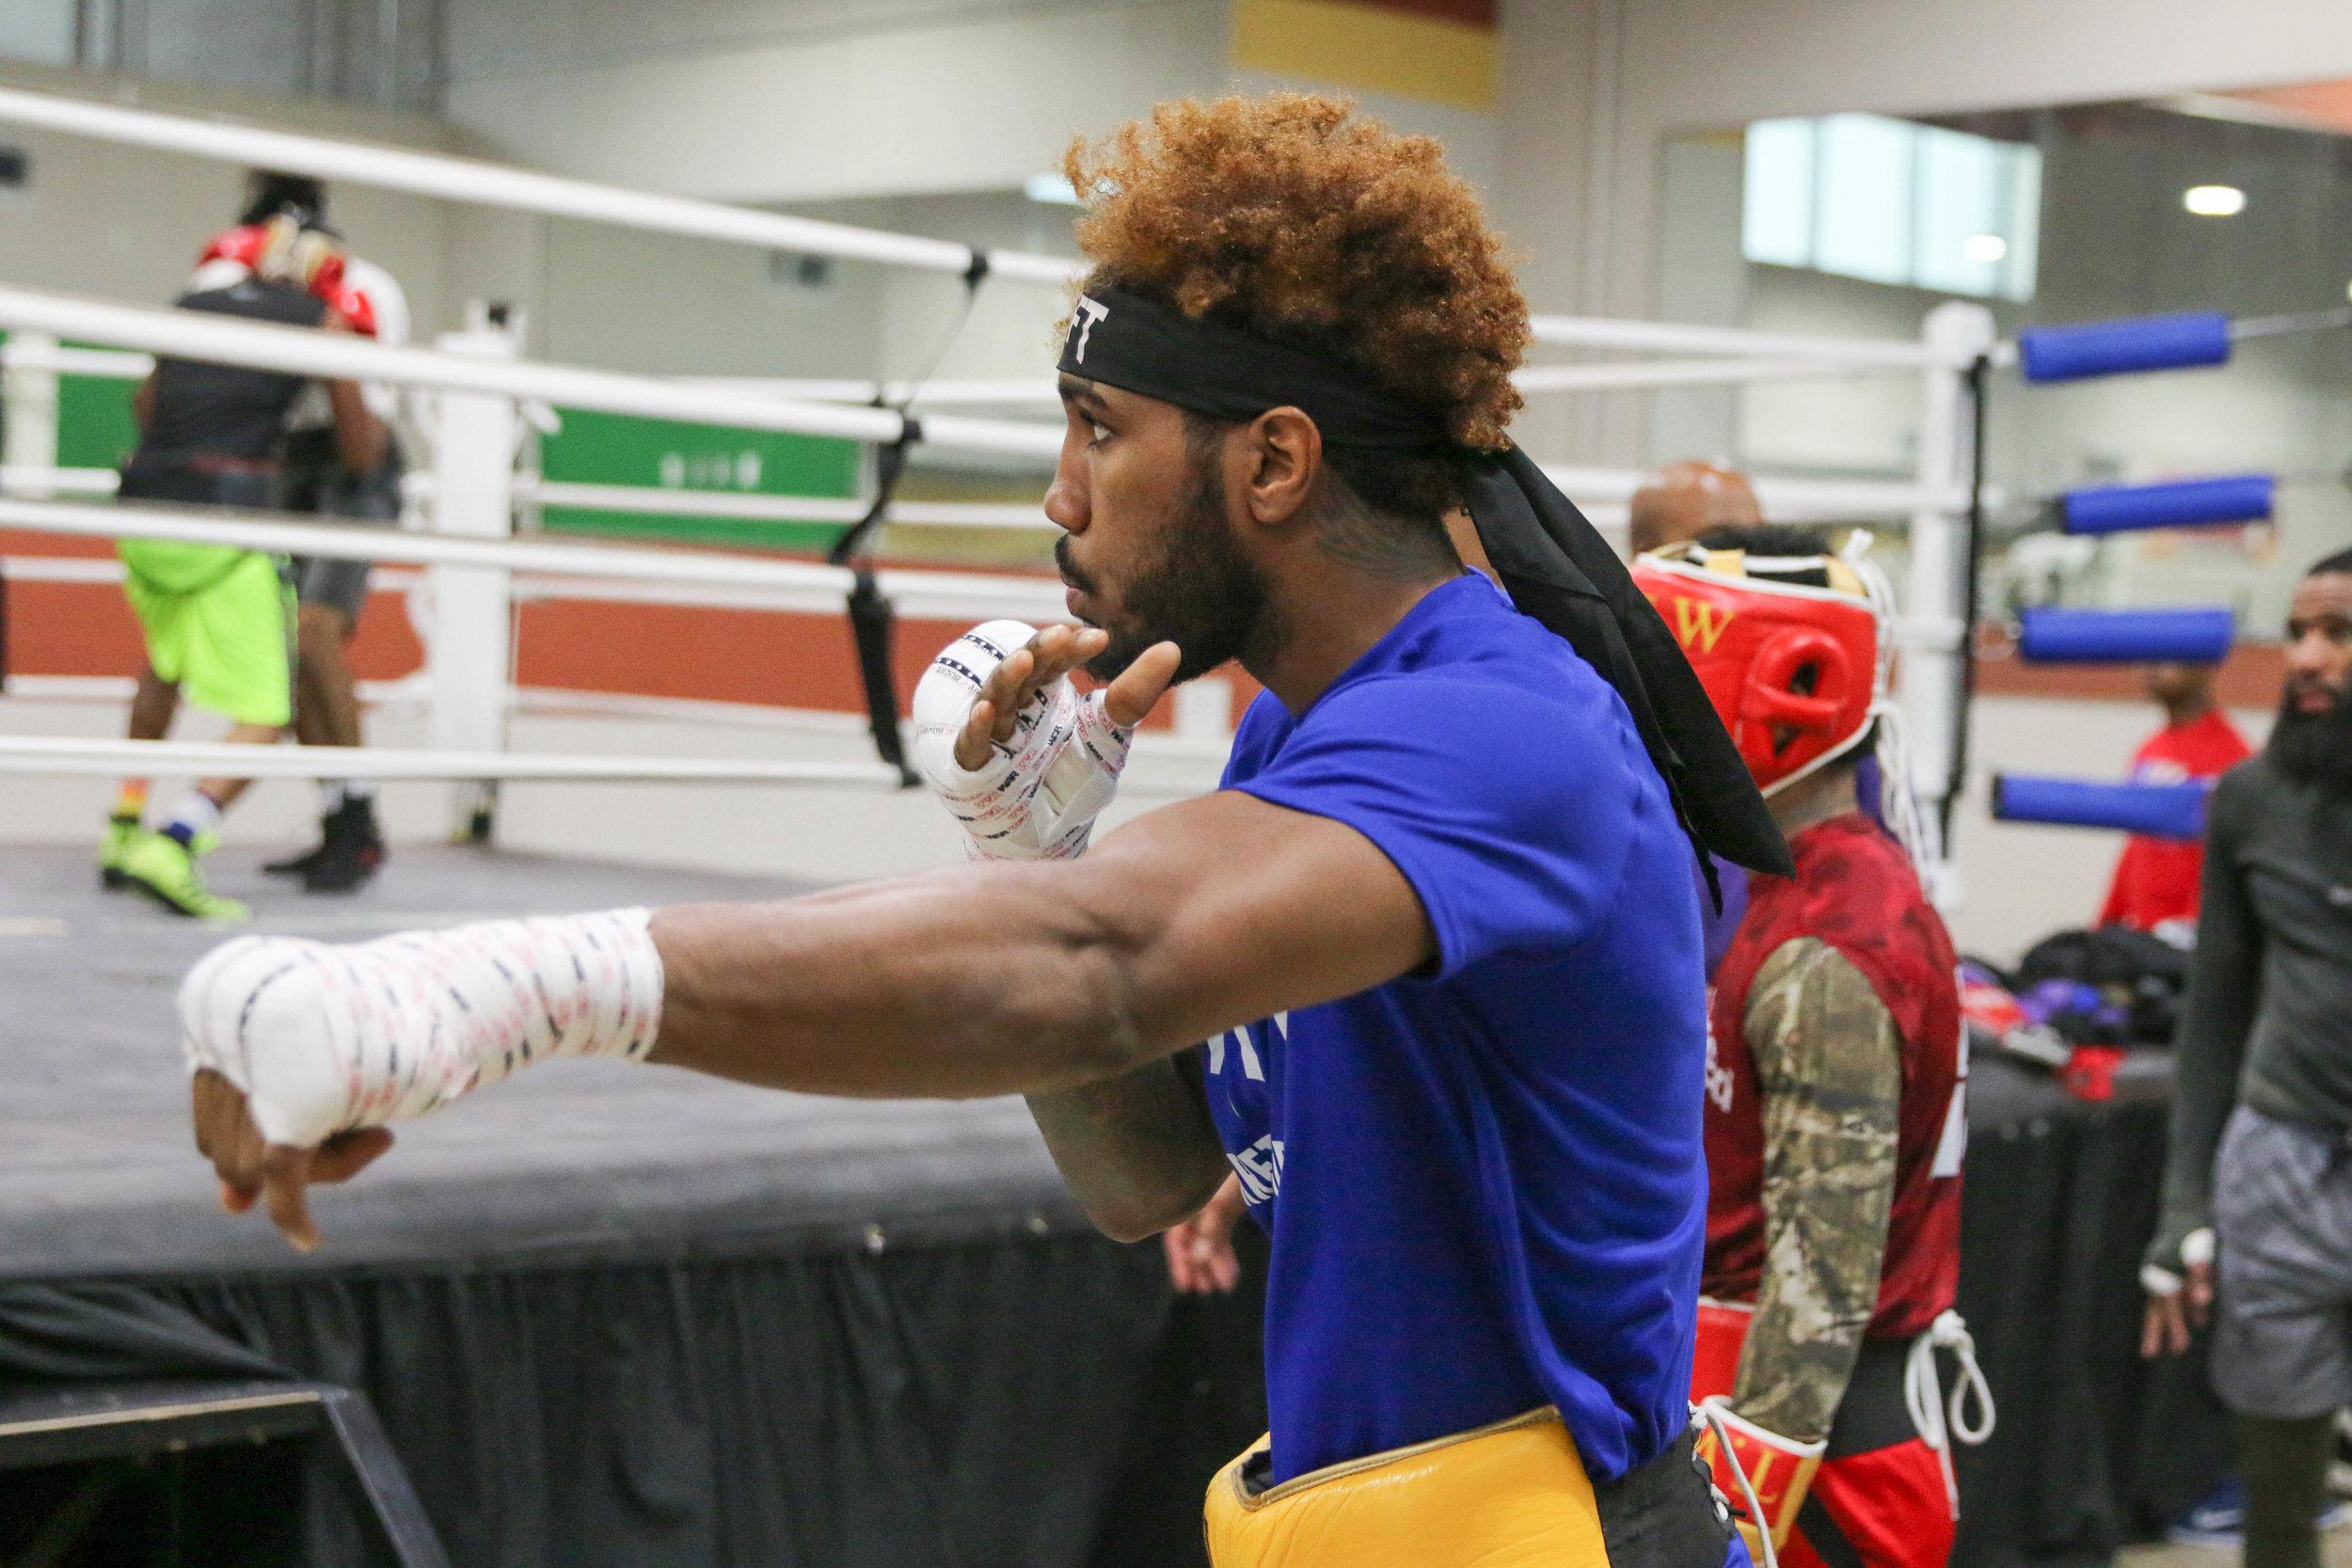 Jarrett Hurd Camp Visit_02_25_2017_Workout_Leo Wilson Jr. _ Premier Boxing Champions2.jpg